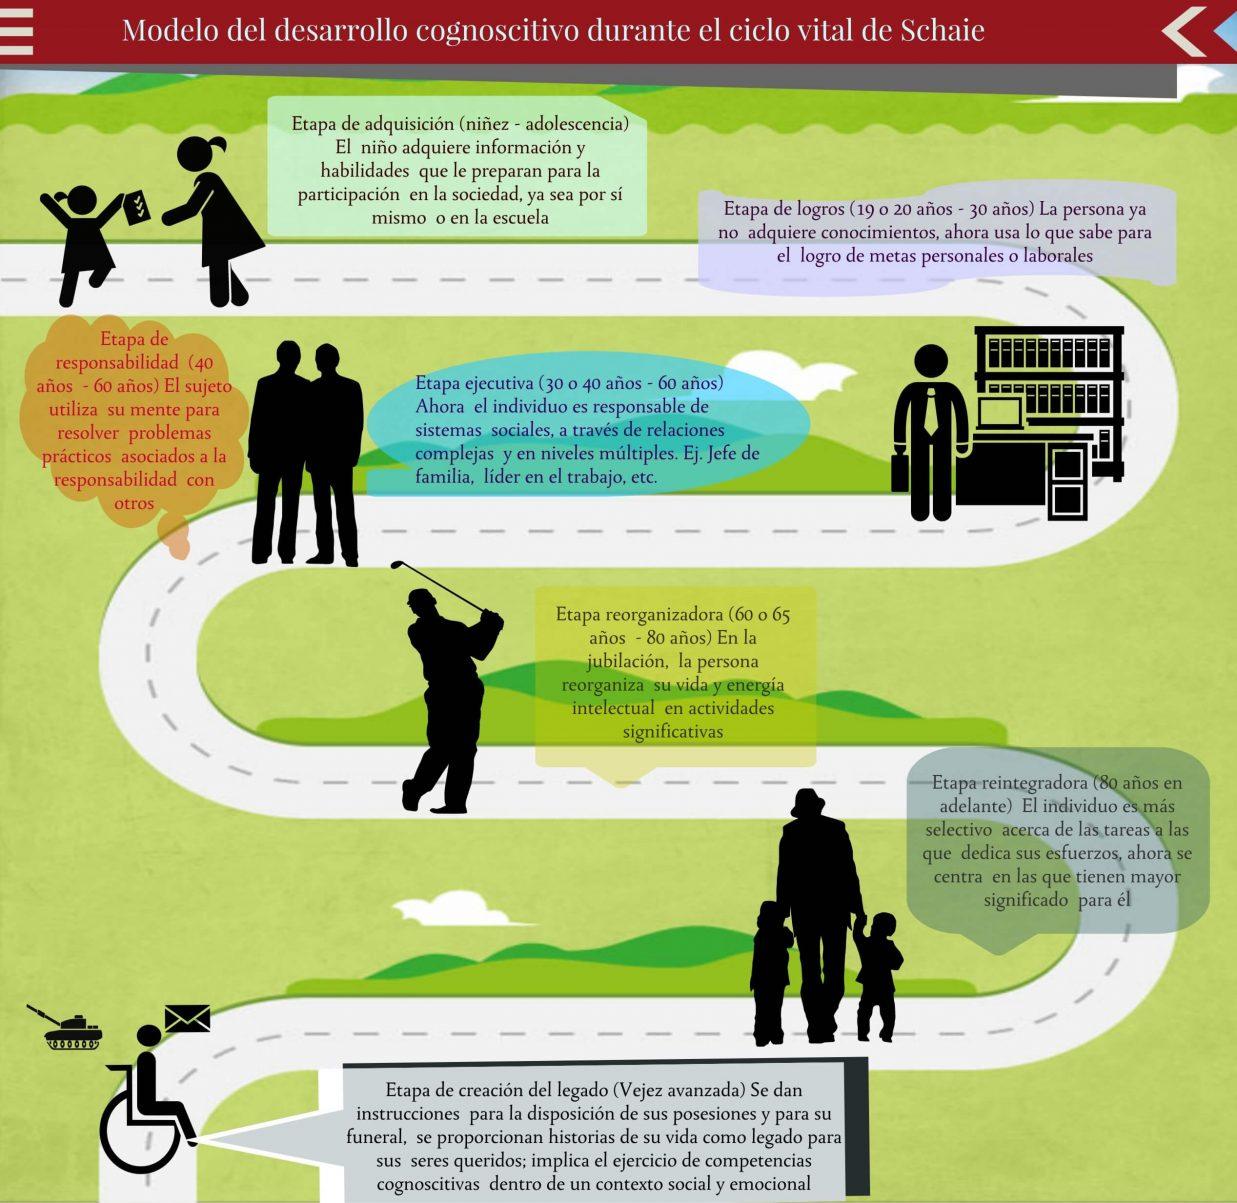 Infografia Modelo desarrollo cognoscitivo Shaie